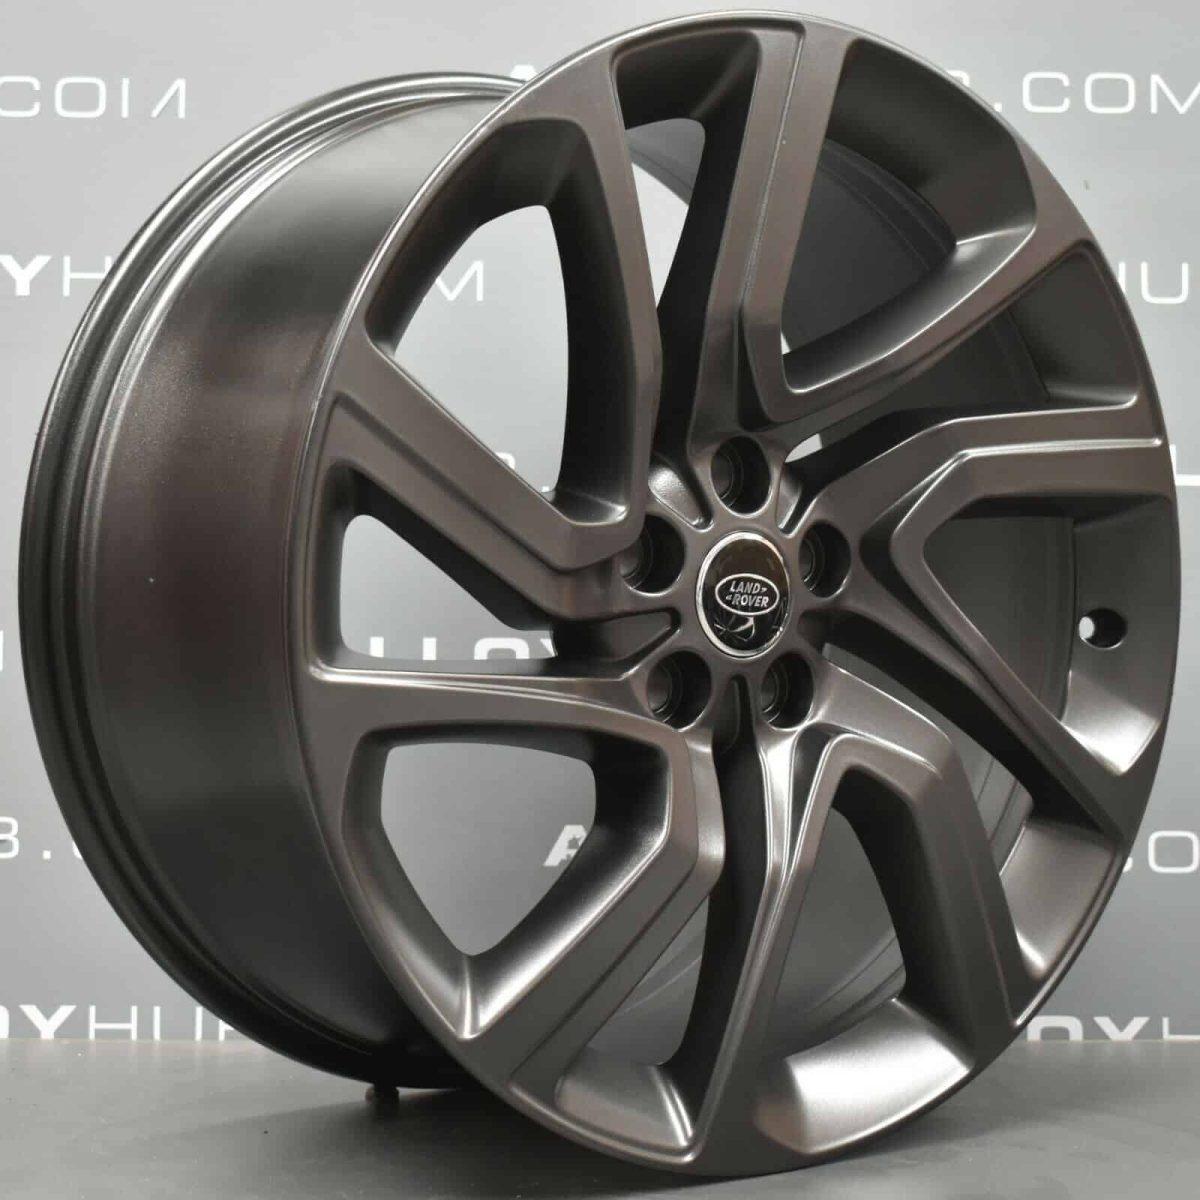 "Genuine Land Rover Range Rover Sport L494 Vogue L405 Style 5085 21"" inch 5 Split-Spoke Technical Satin Grey Alloy Wheels LR099136"